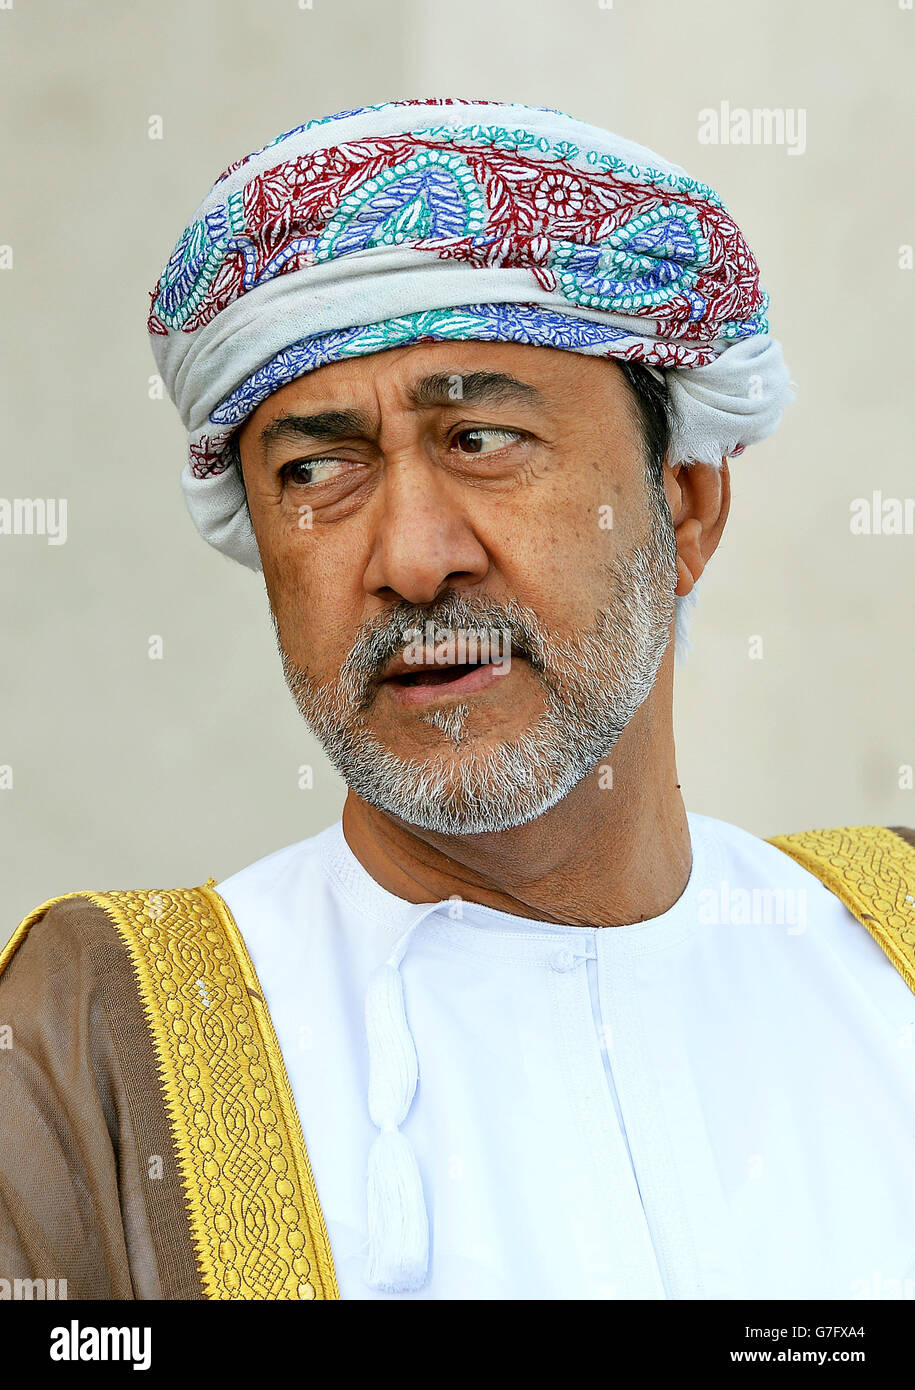 Sayyid Haitham Bin Tariq Al Stock Photos & Sayyid Haitham